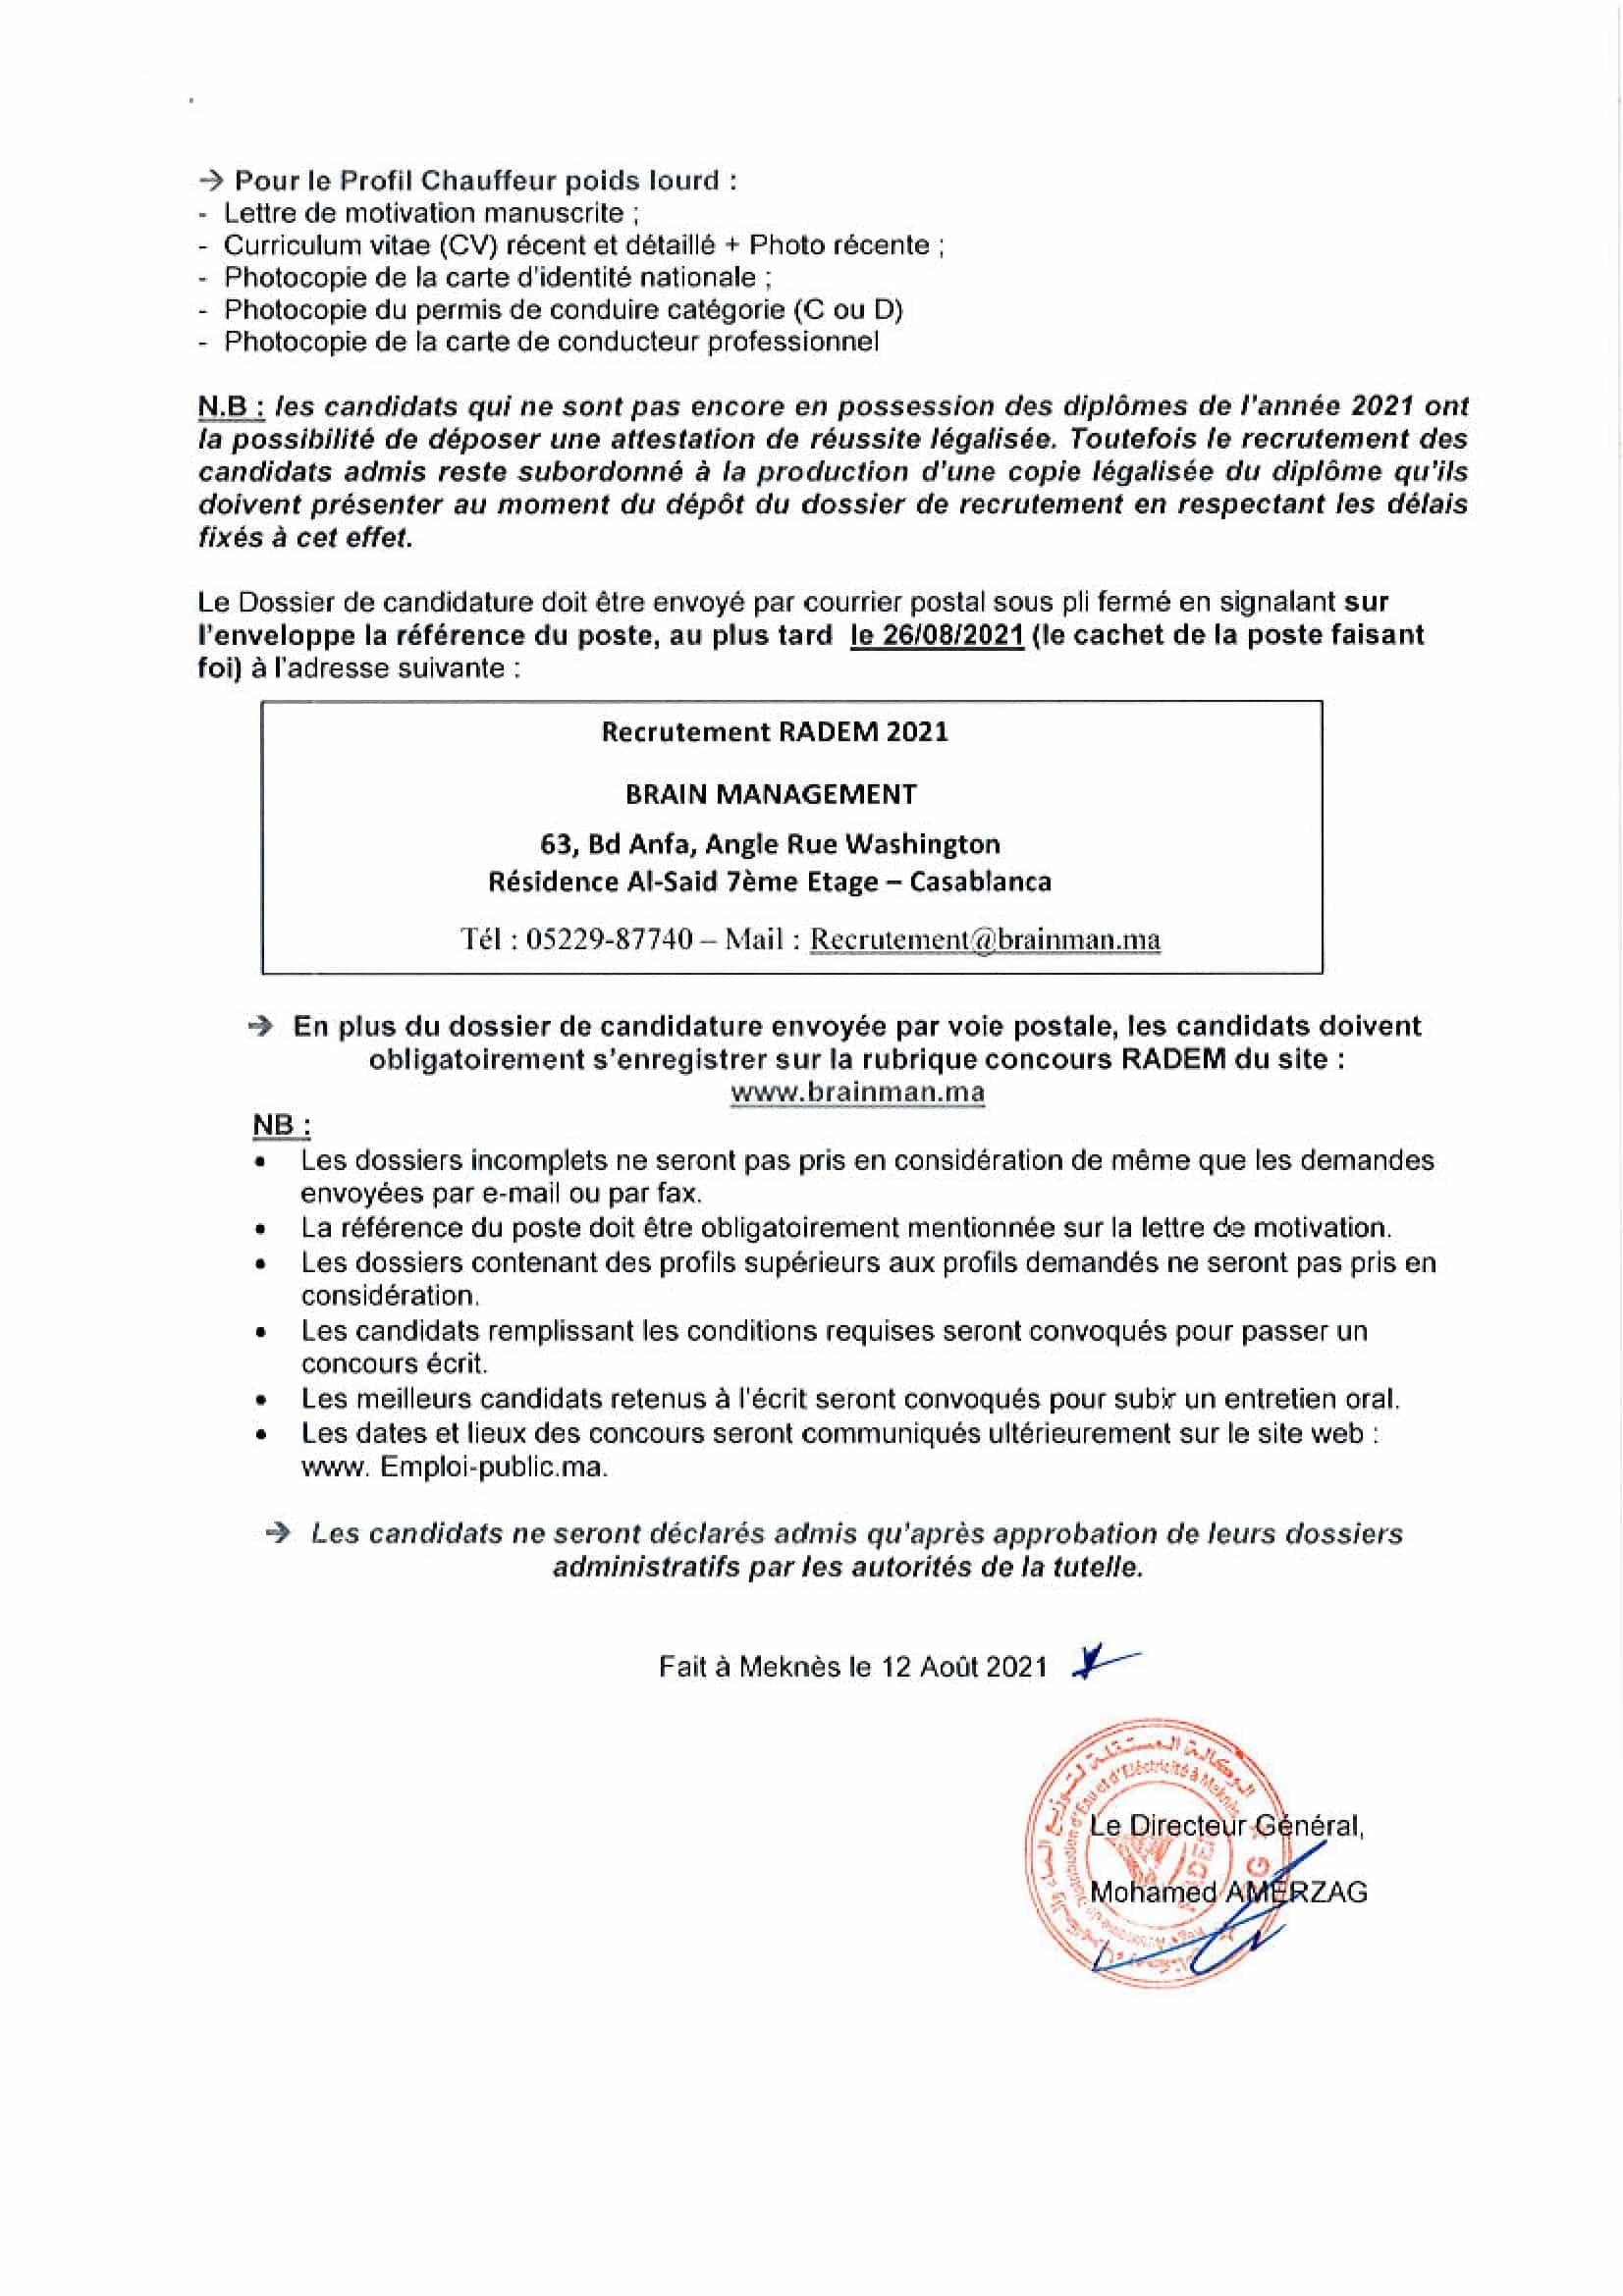 AGENTSDEXECUTION 2 Concours de Recrutement RADEM 2021 (30 Postes)